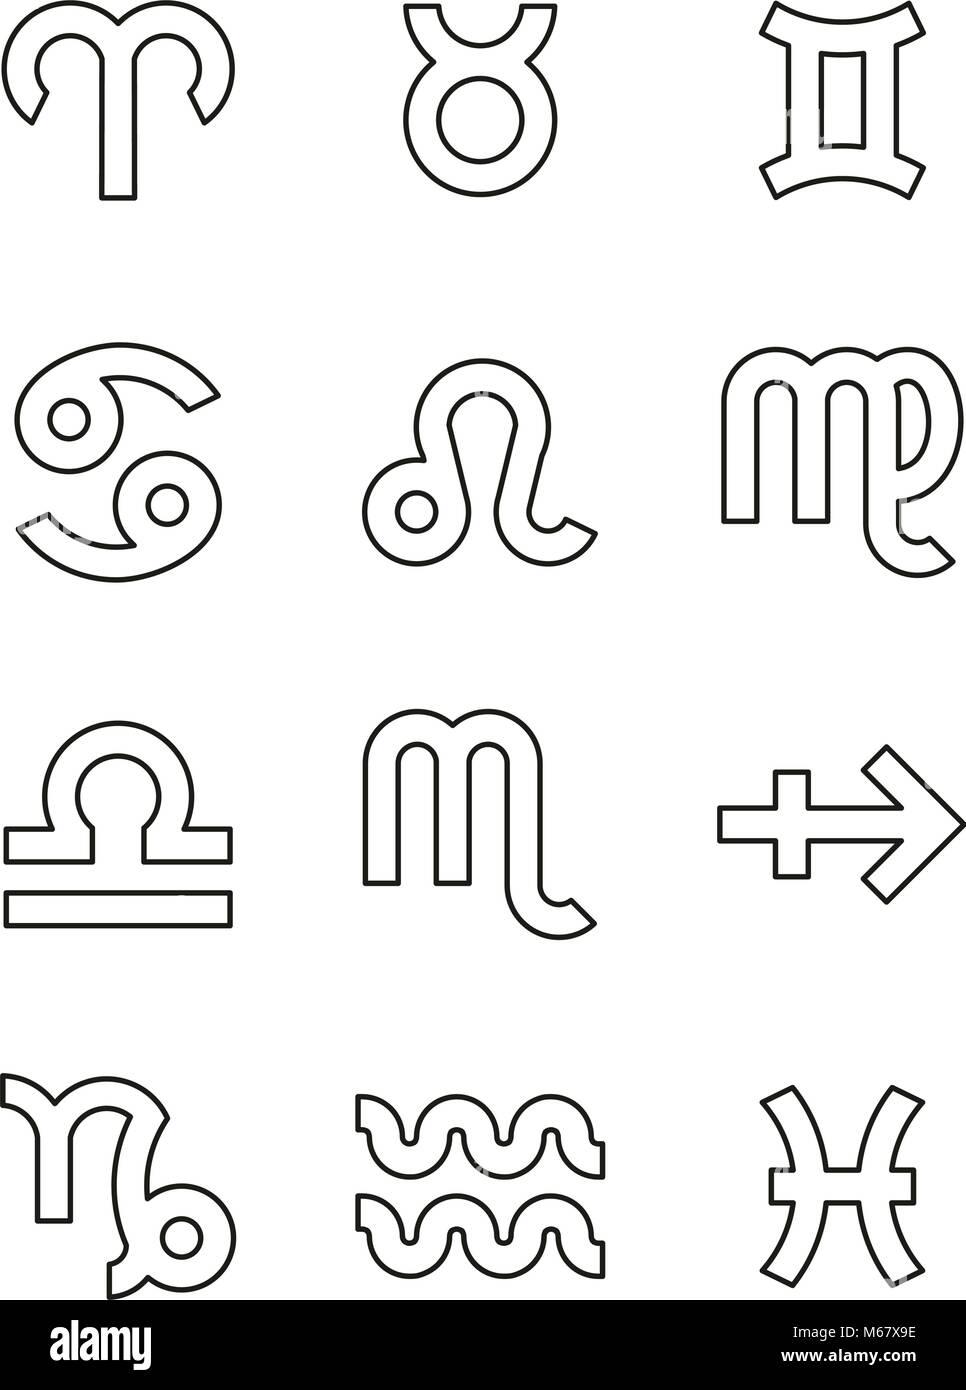 Zodiac Text Symbols Black : zodiac, symbols, black, Zodiac, Symbols, Resolution, Stock, Photography, Images, Alamy